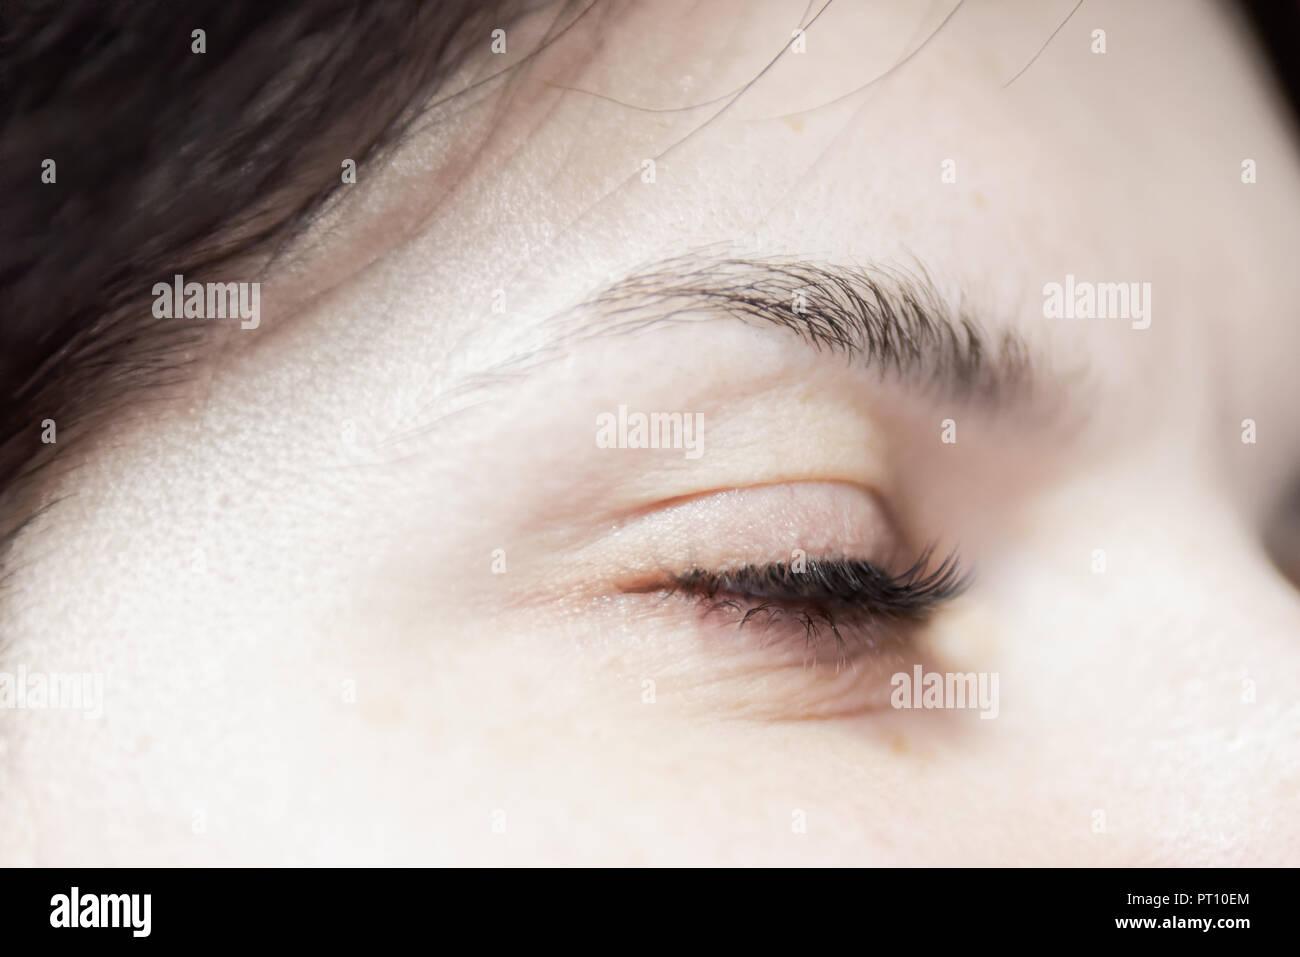 Geschlossen Frau Augen mit langen Wimpern Stockbild